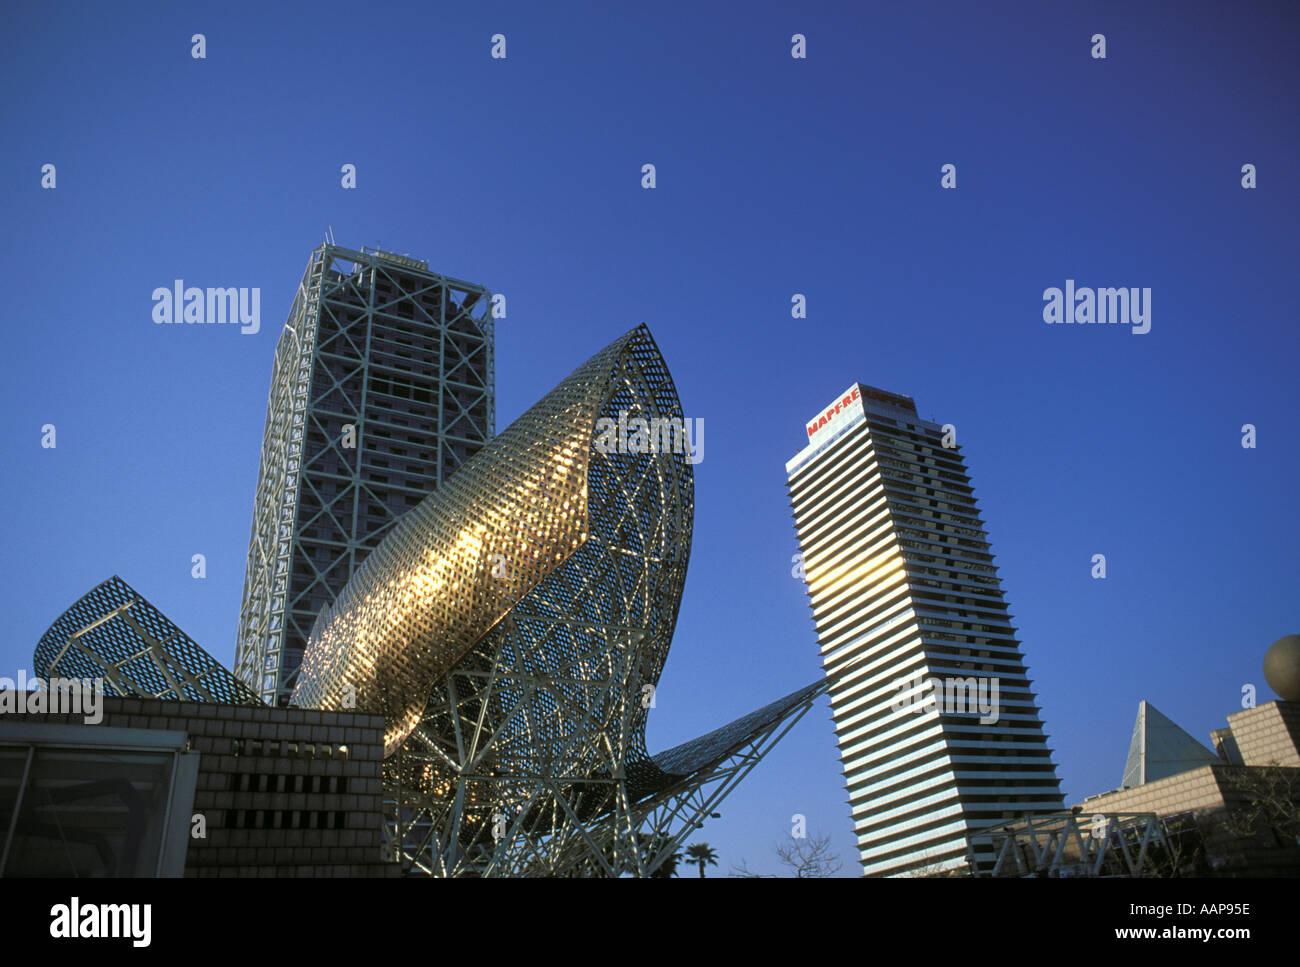 Peix Frank Gehry s fish sculpture Barcelona Spain - Stock Image